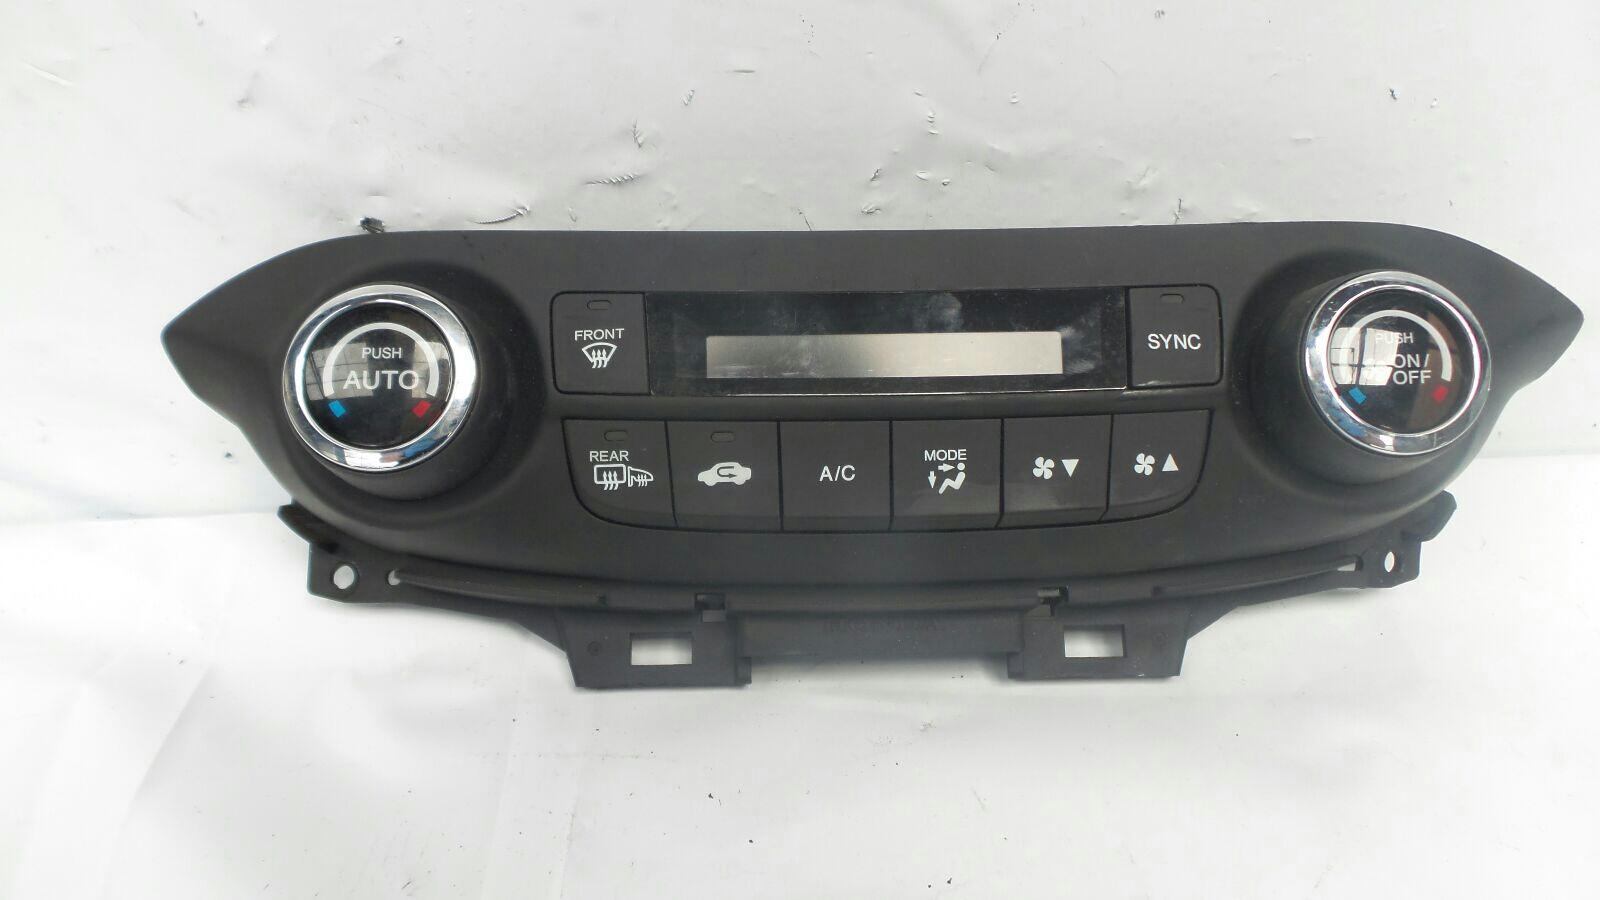 Honda CR-V 2012 To 2015 EX i-VTEC 4WD Heater Control Assembly